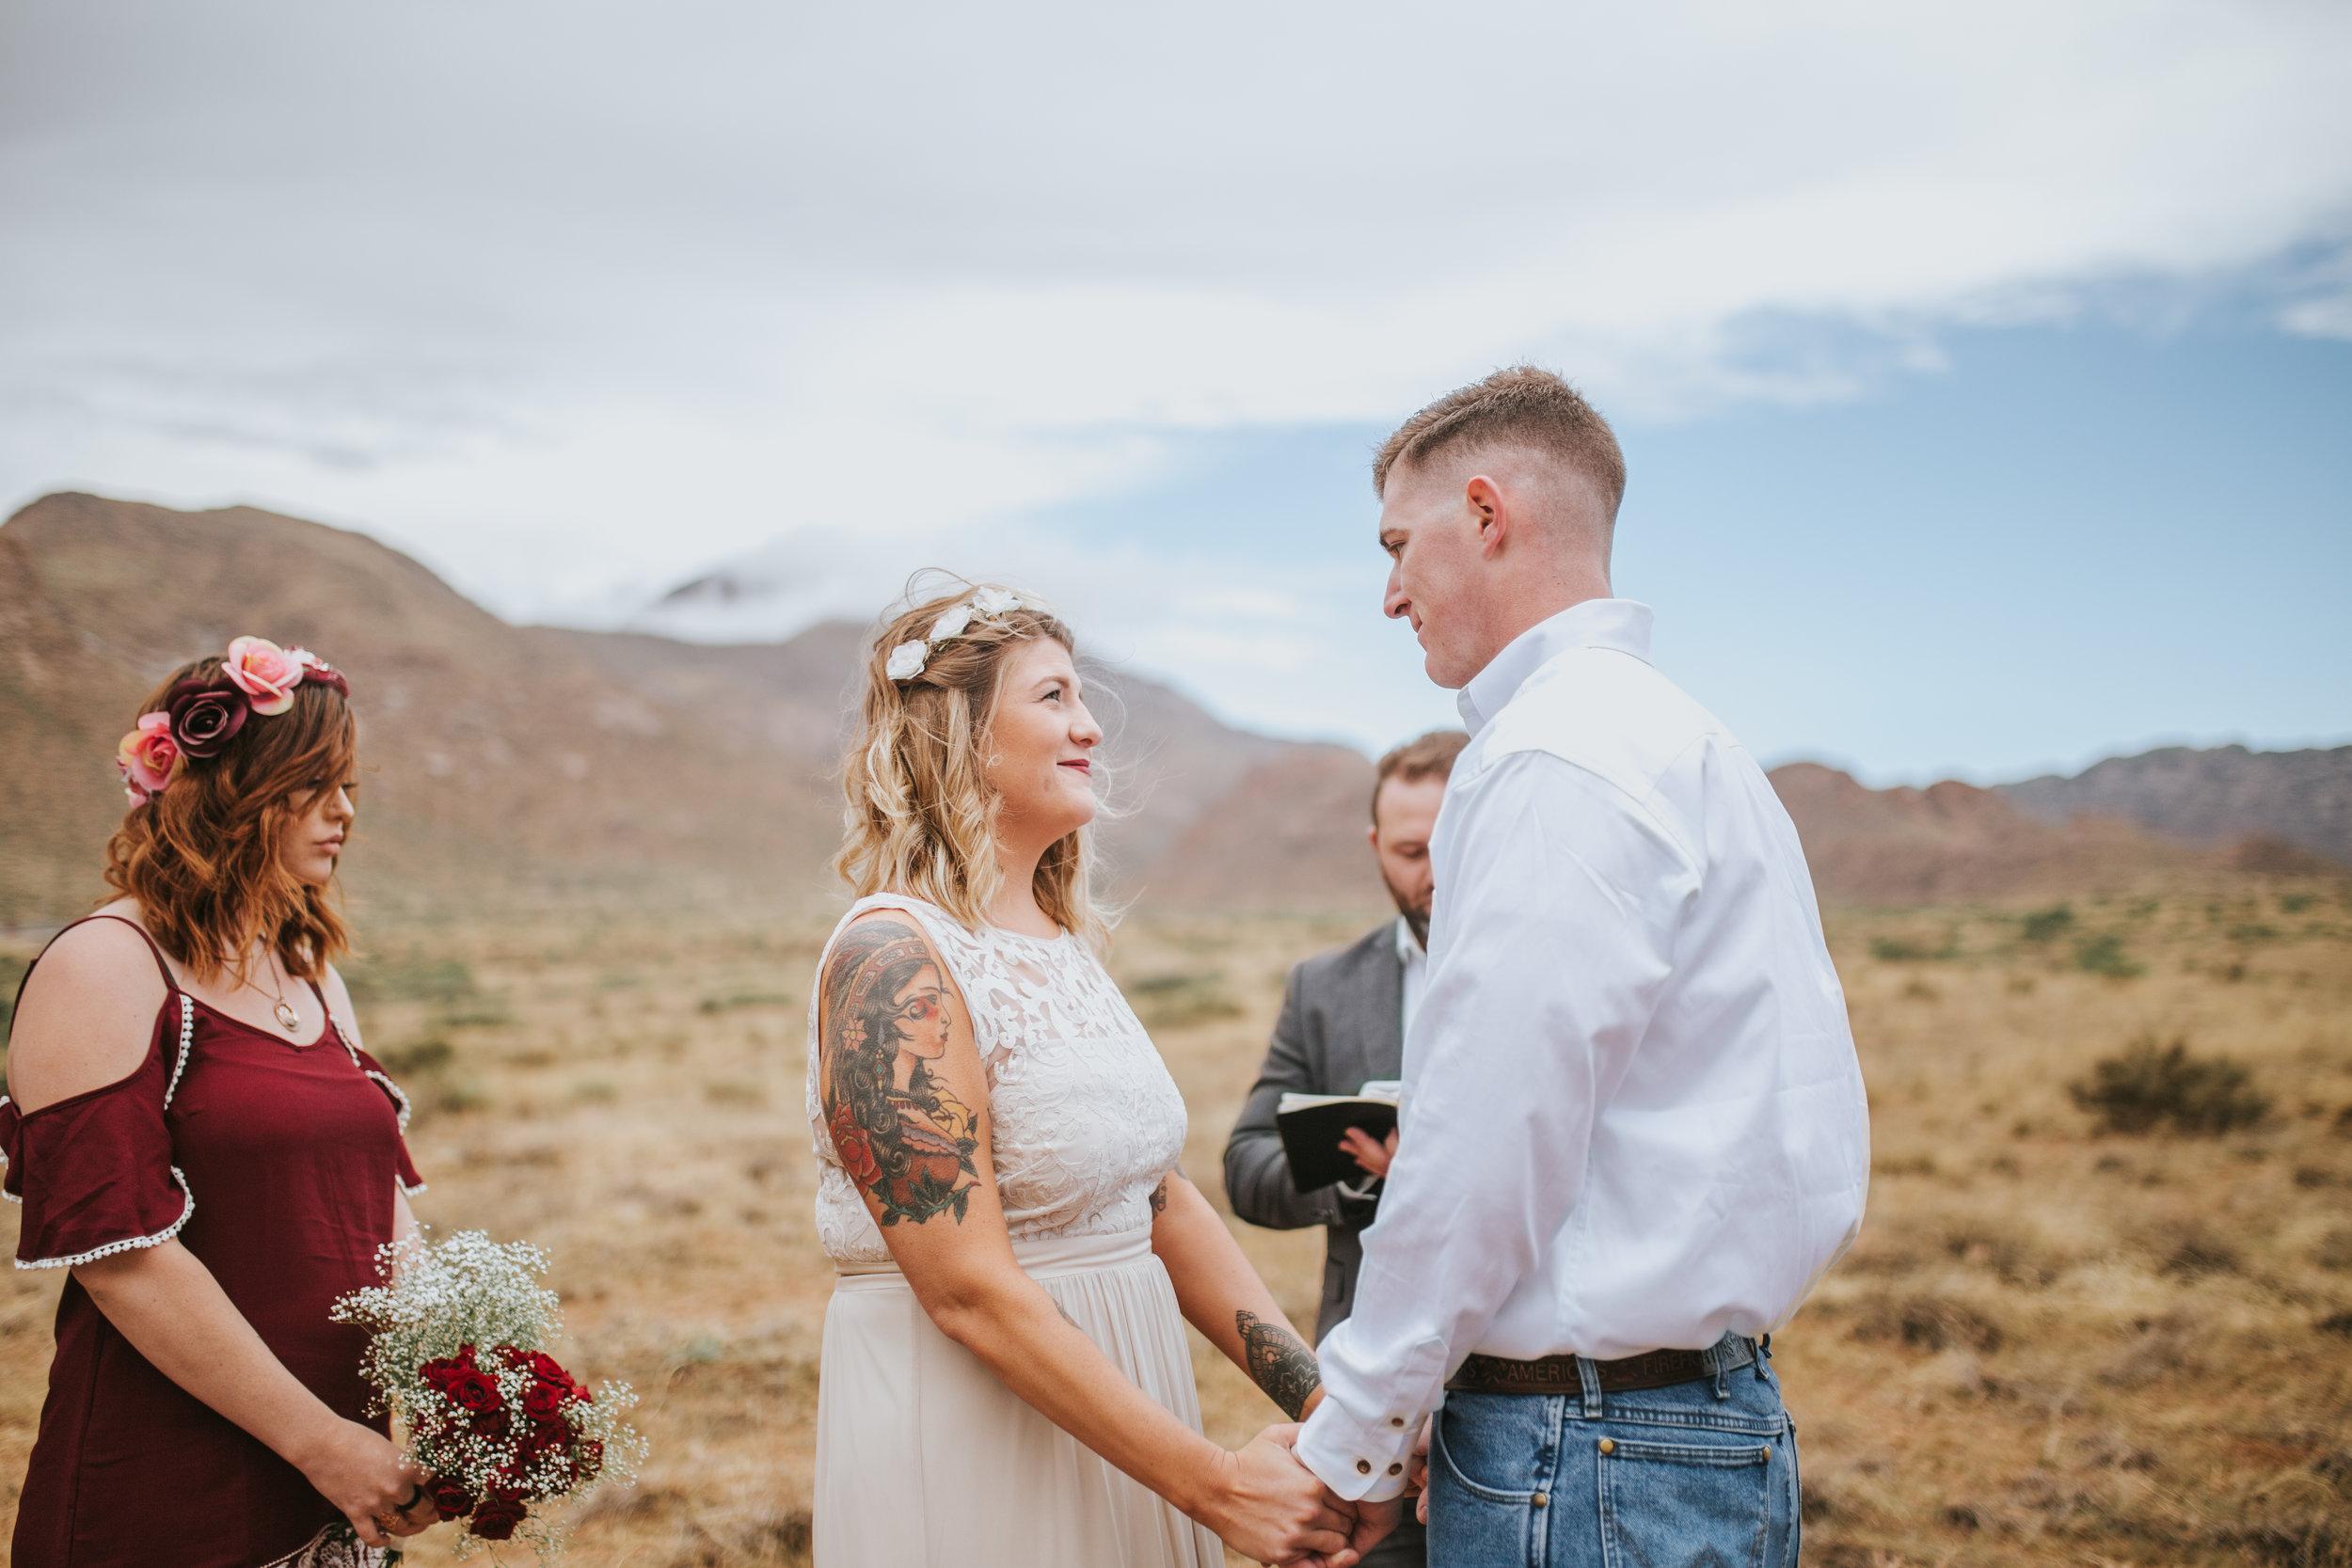 el-paso-texas-wedding-photographer-15